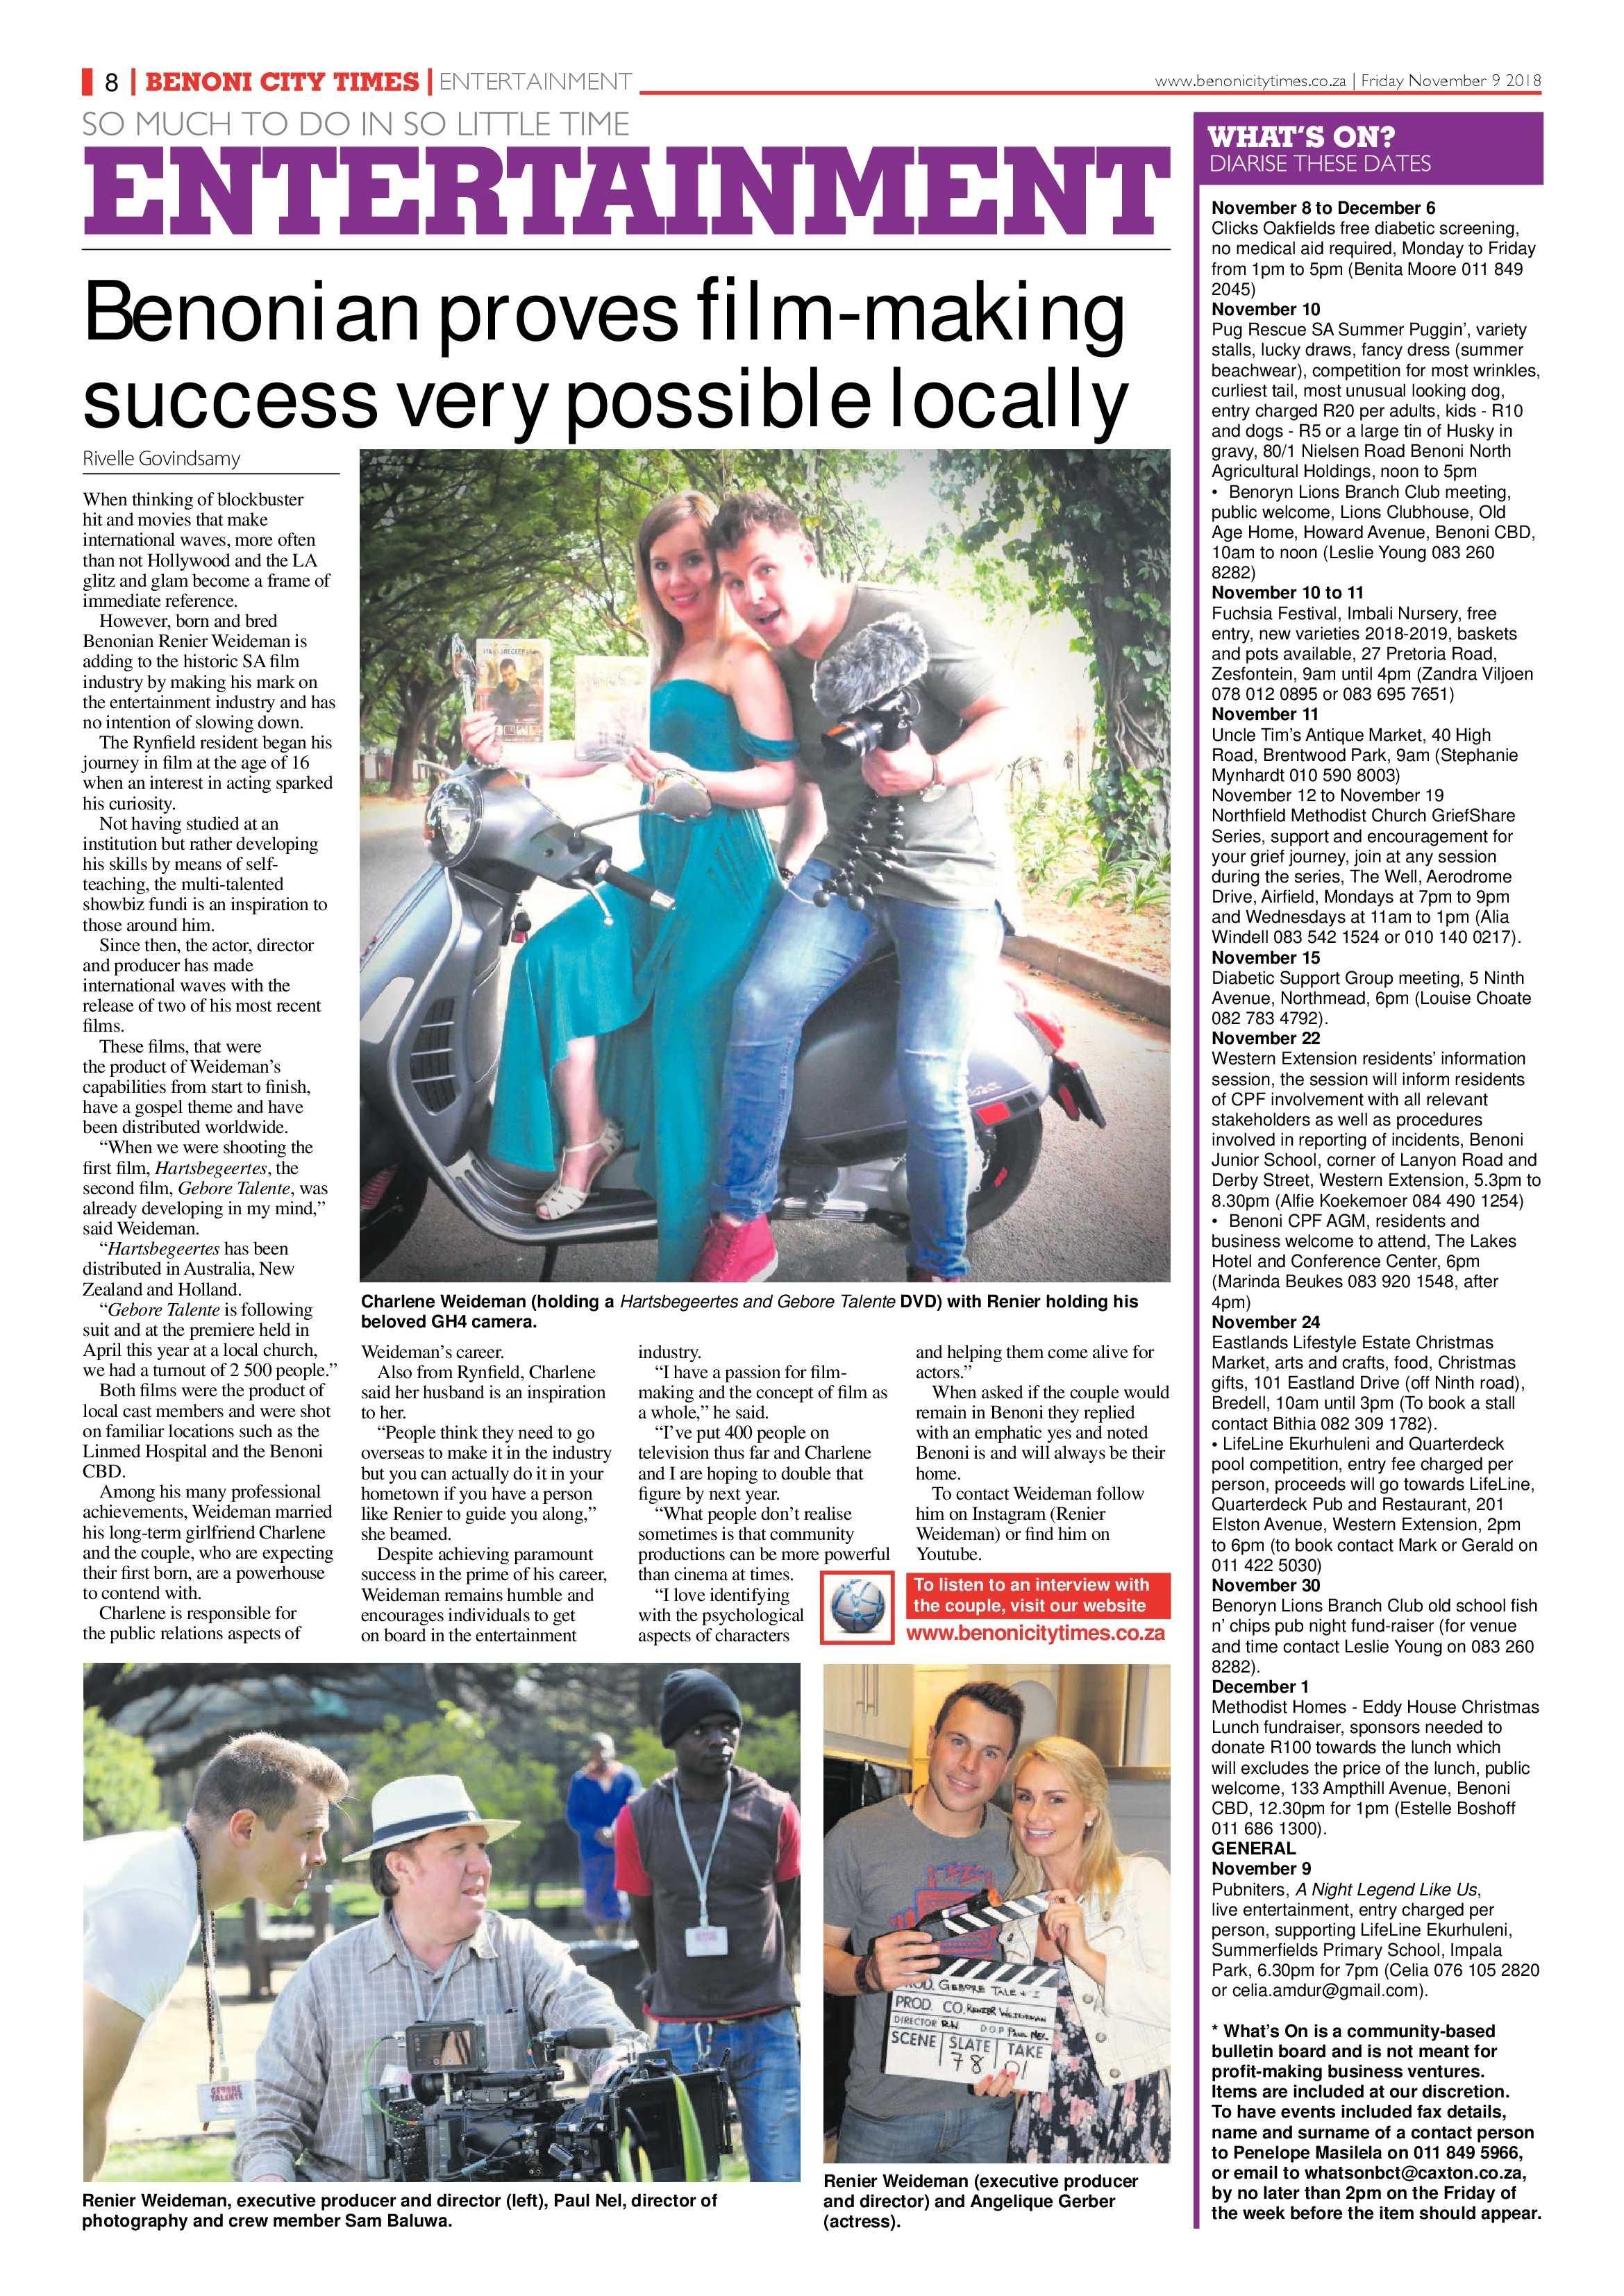 benoni-city-times-08-november-2018-epapers-page-8